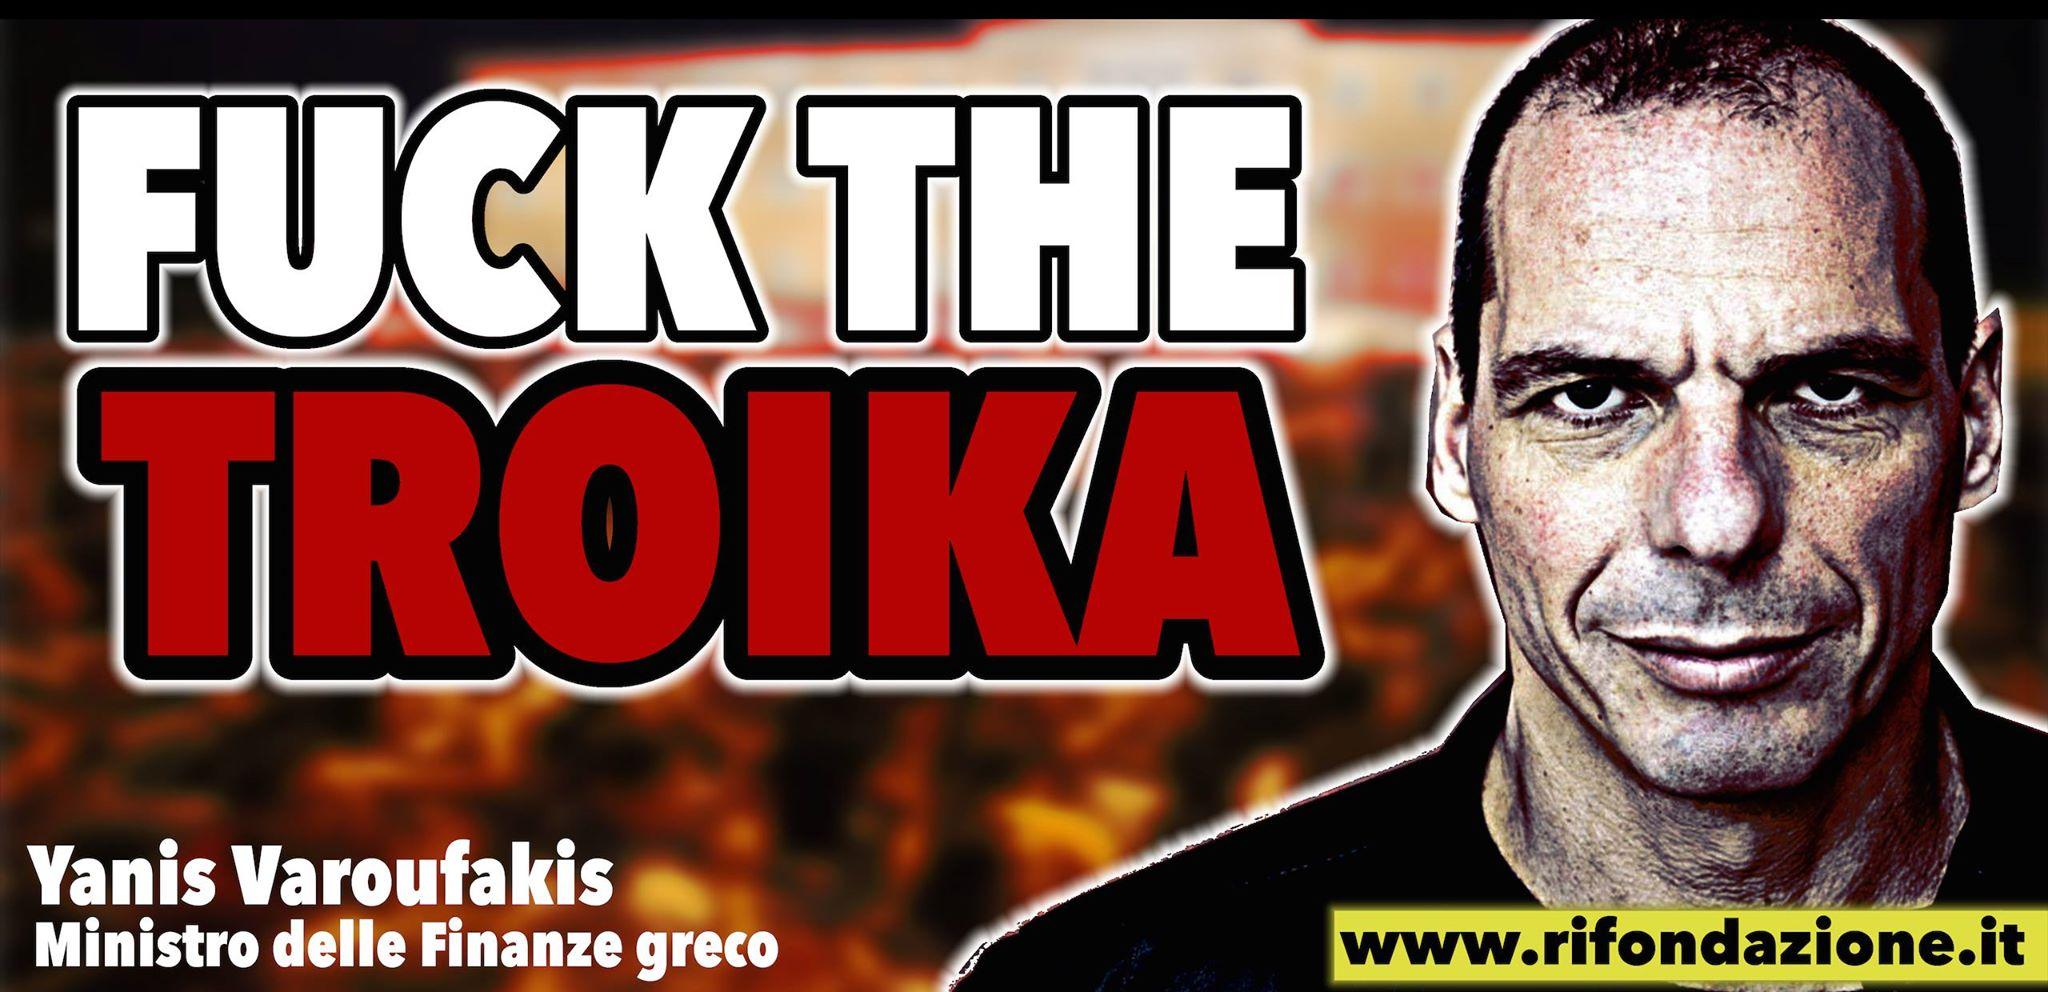 tsipras fuck the troika